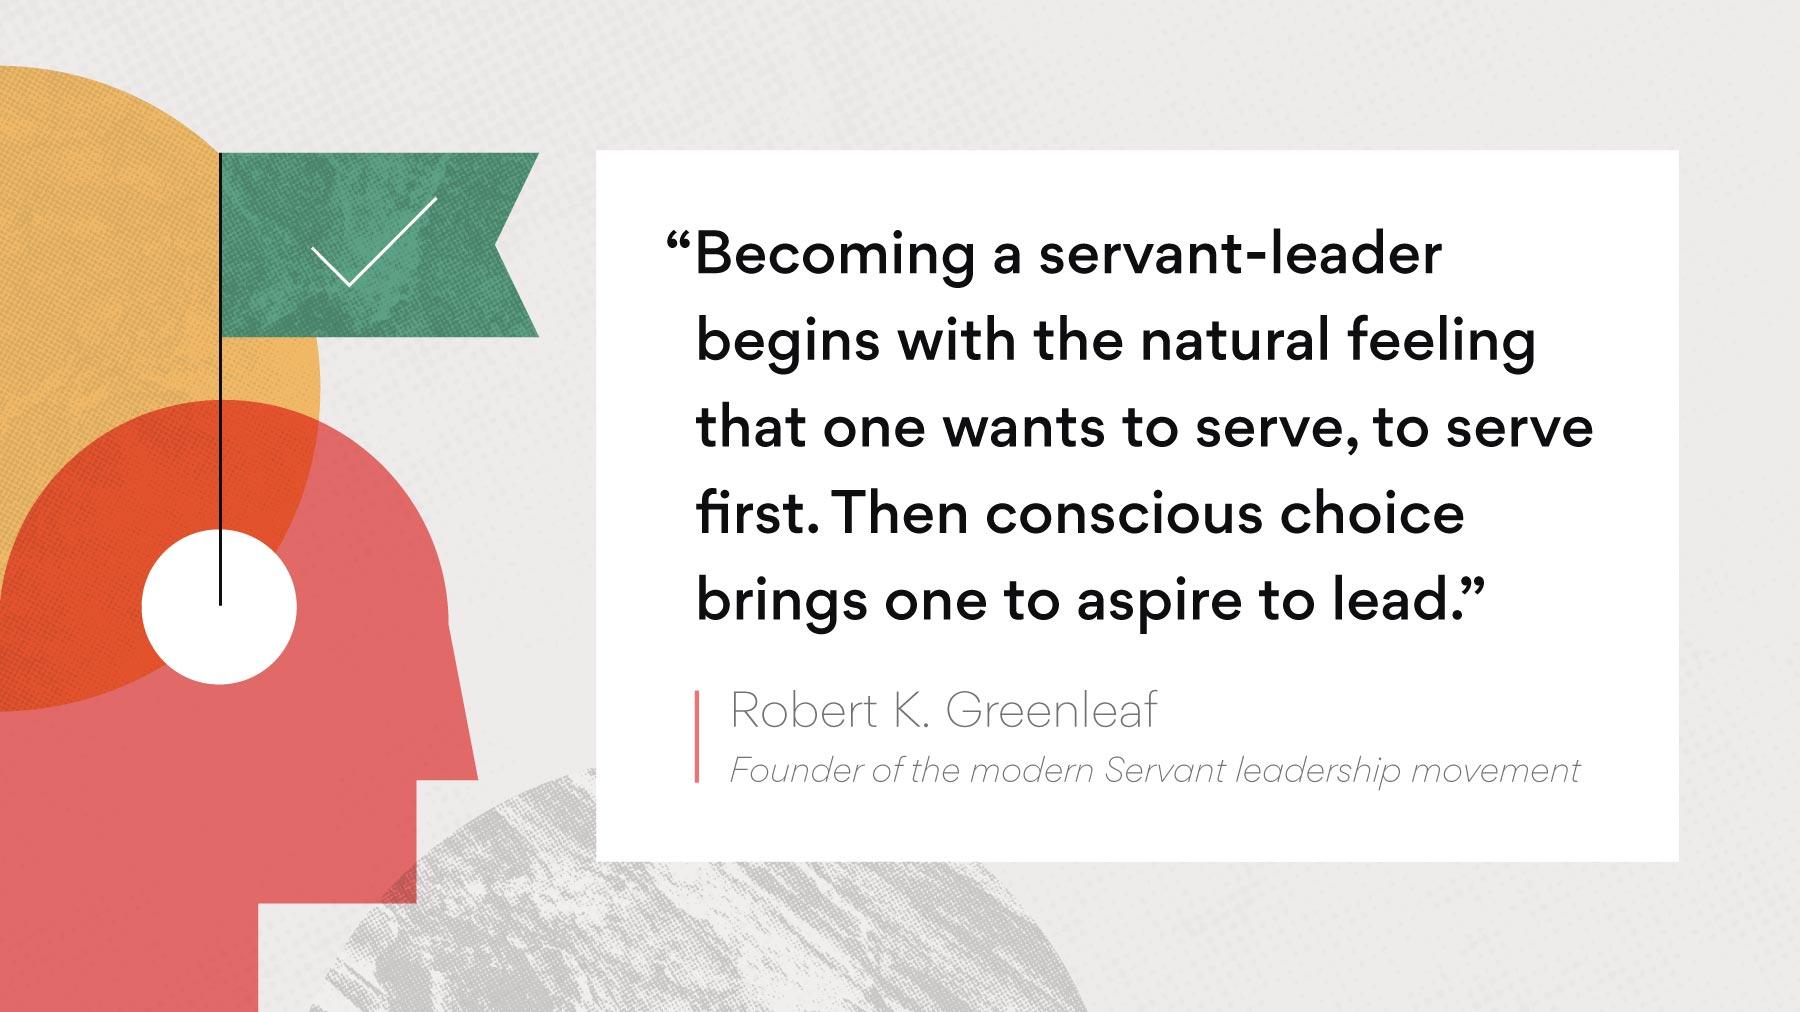 Origin of servant leadership